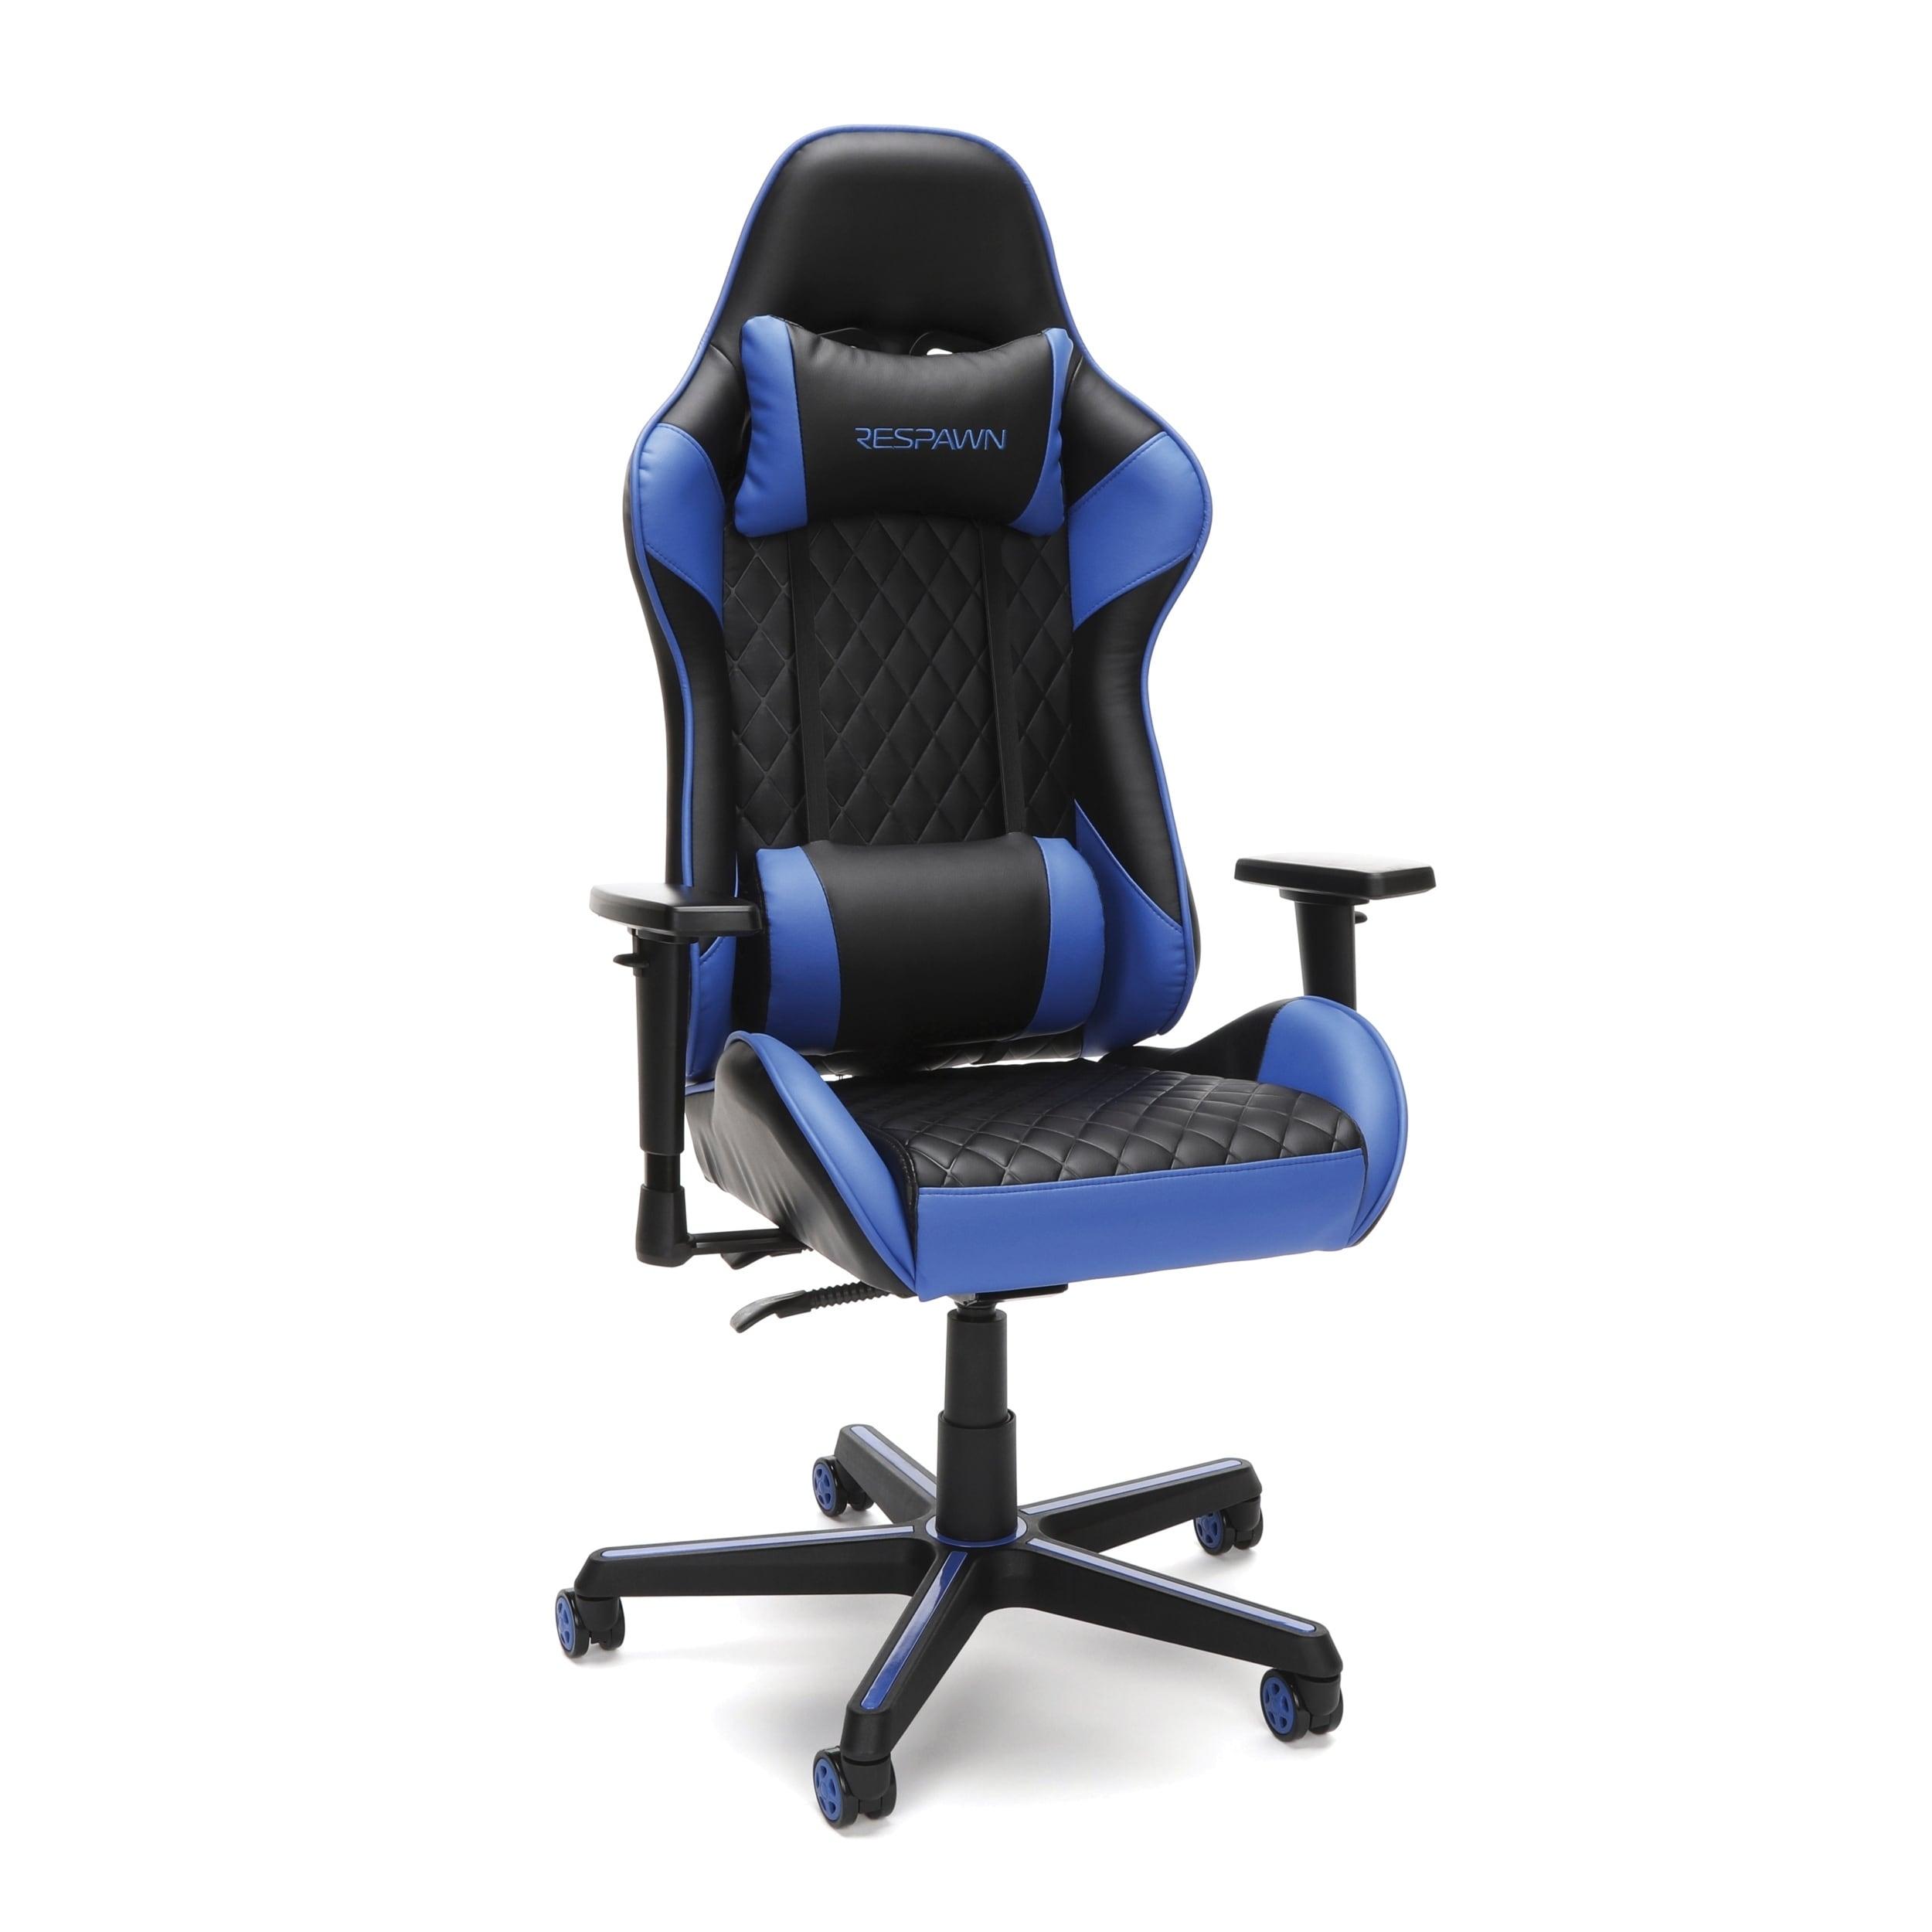 Stupendous Respawn 100 Racing Style Gaming Chair Reclining Ergonomic Lamtechconsult Wood Chair Design Ideas Lamtechconsultcom